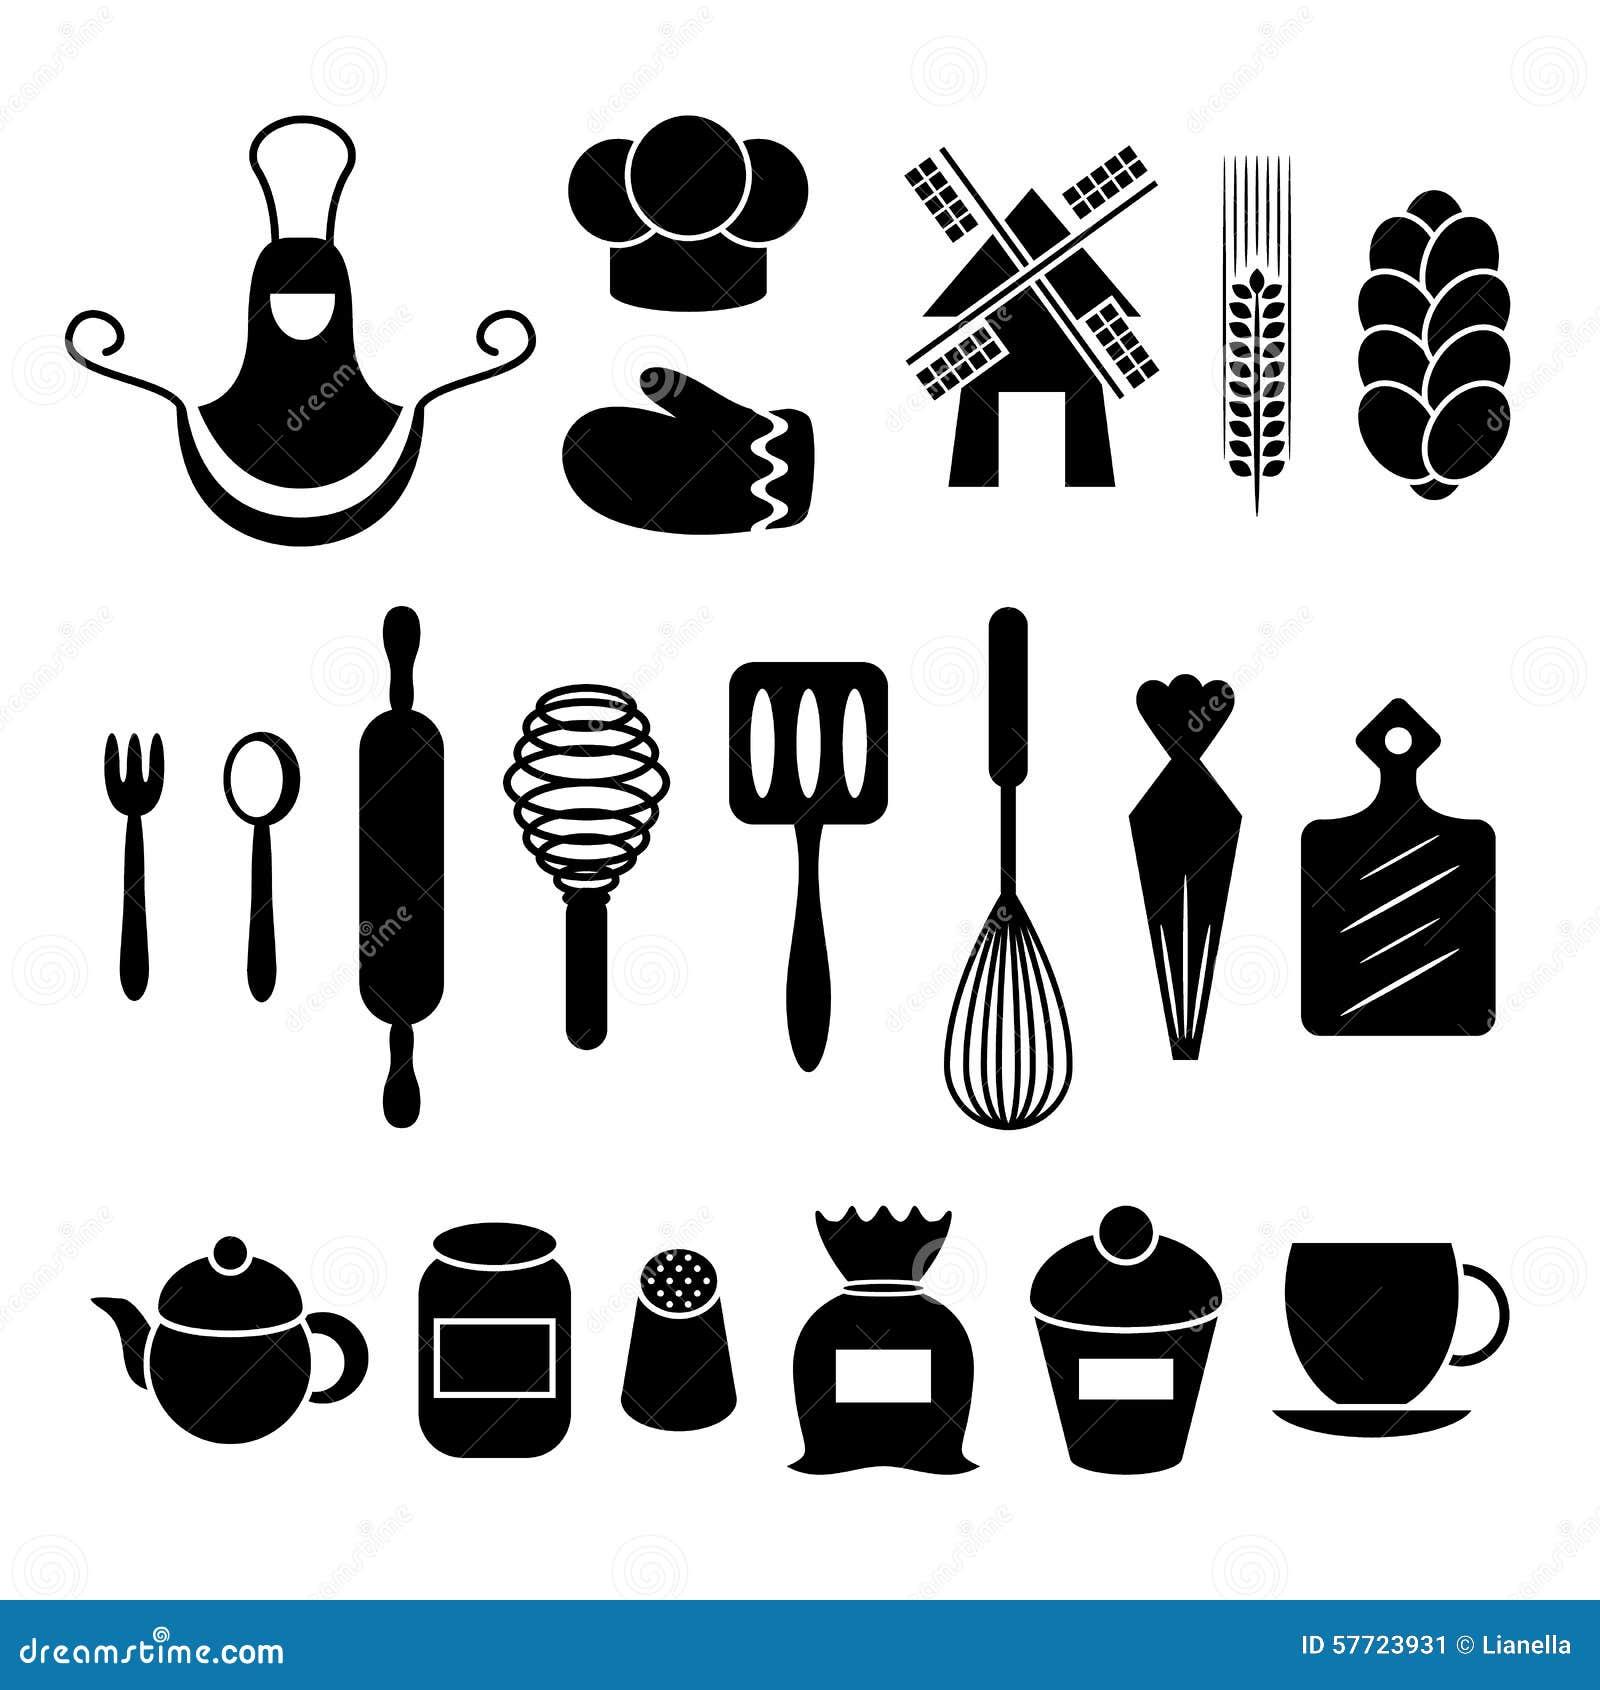 White tudor apron -  Stock Illustration Baking Kitchen Tools Silhouettes Set Apron Gauntlet Spoon Flour Rolling Whisk Pot Teakettle Vector